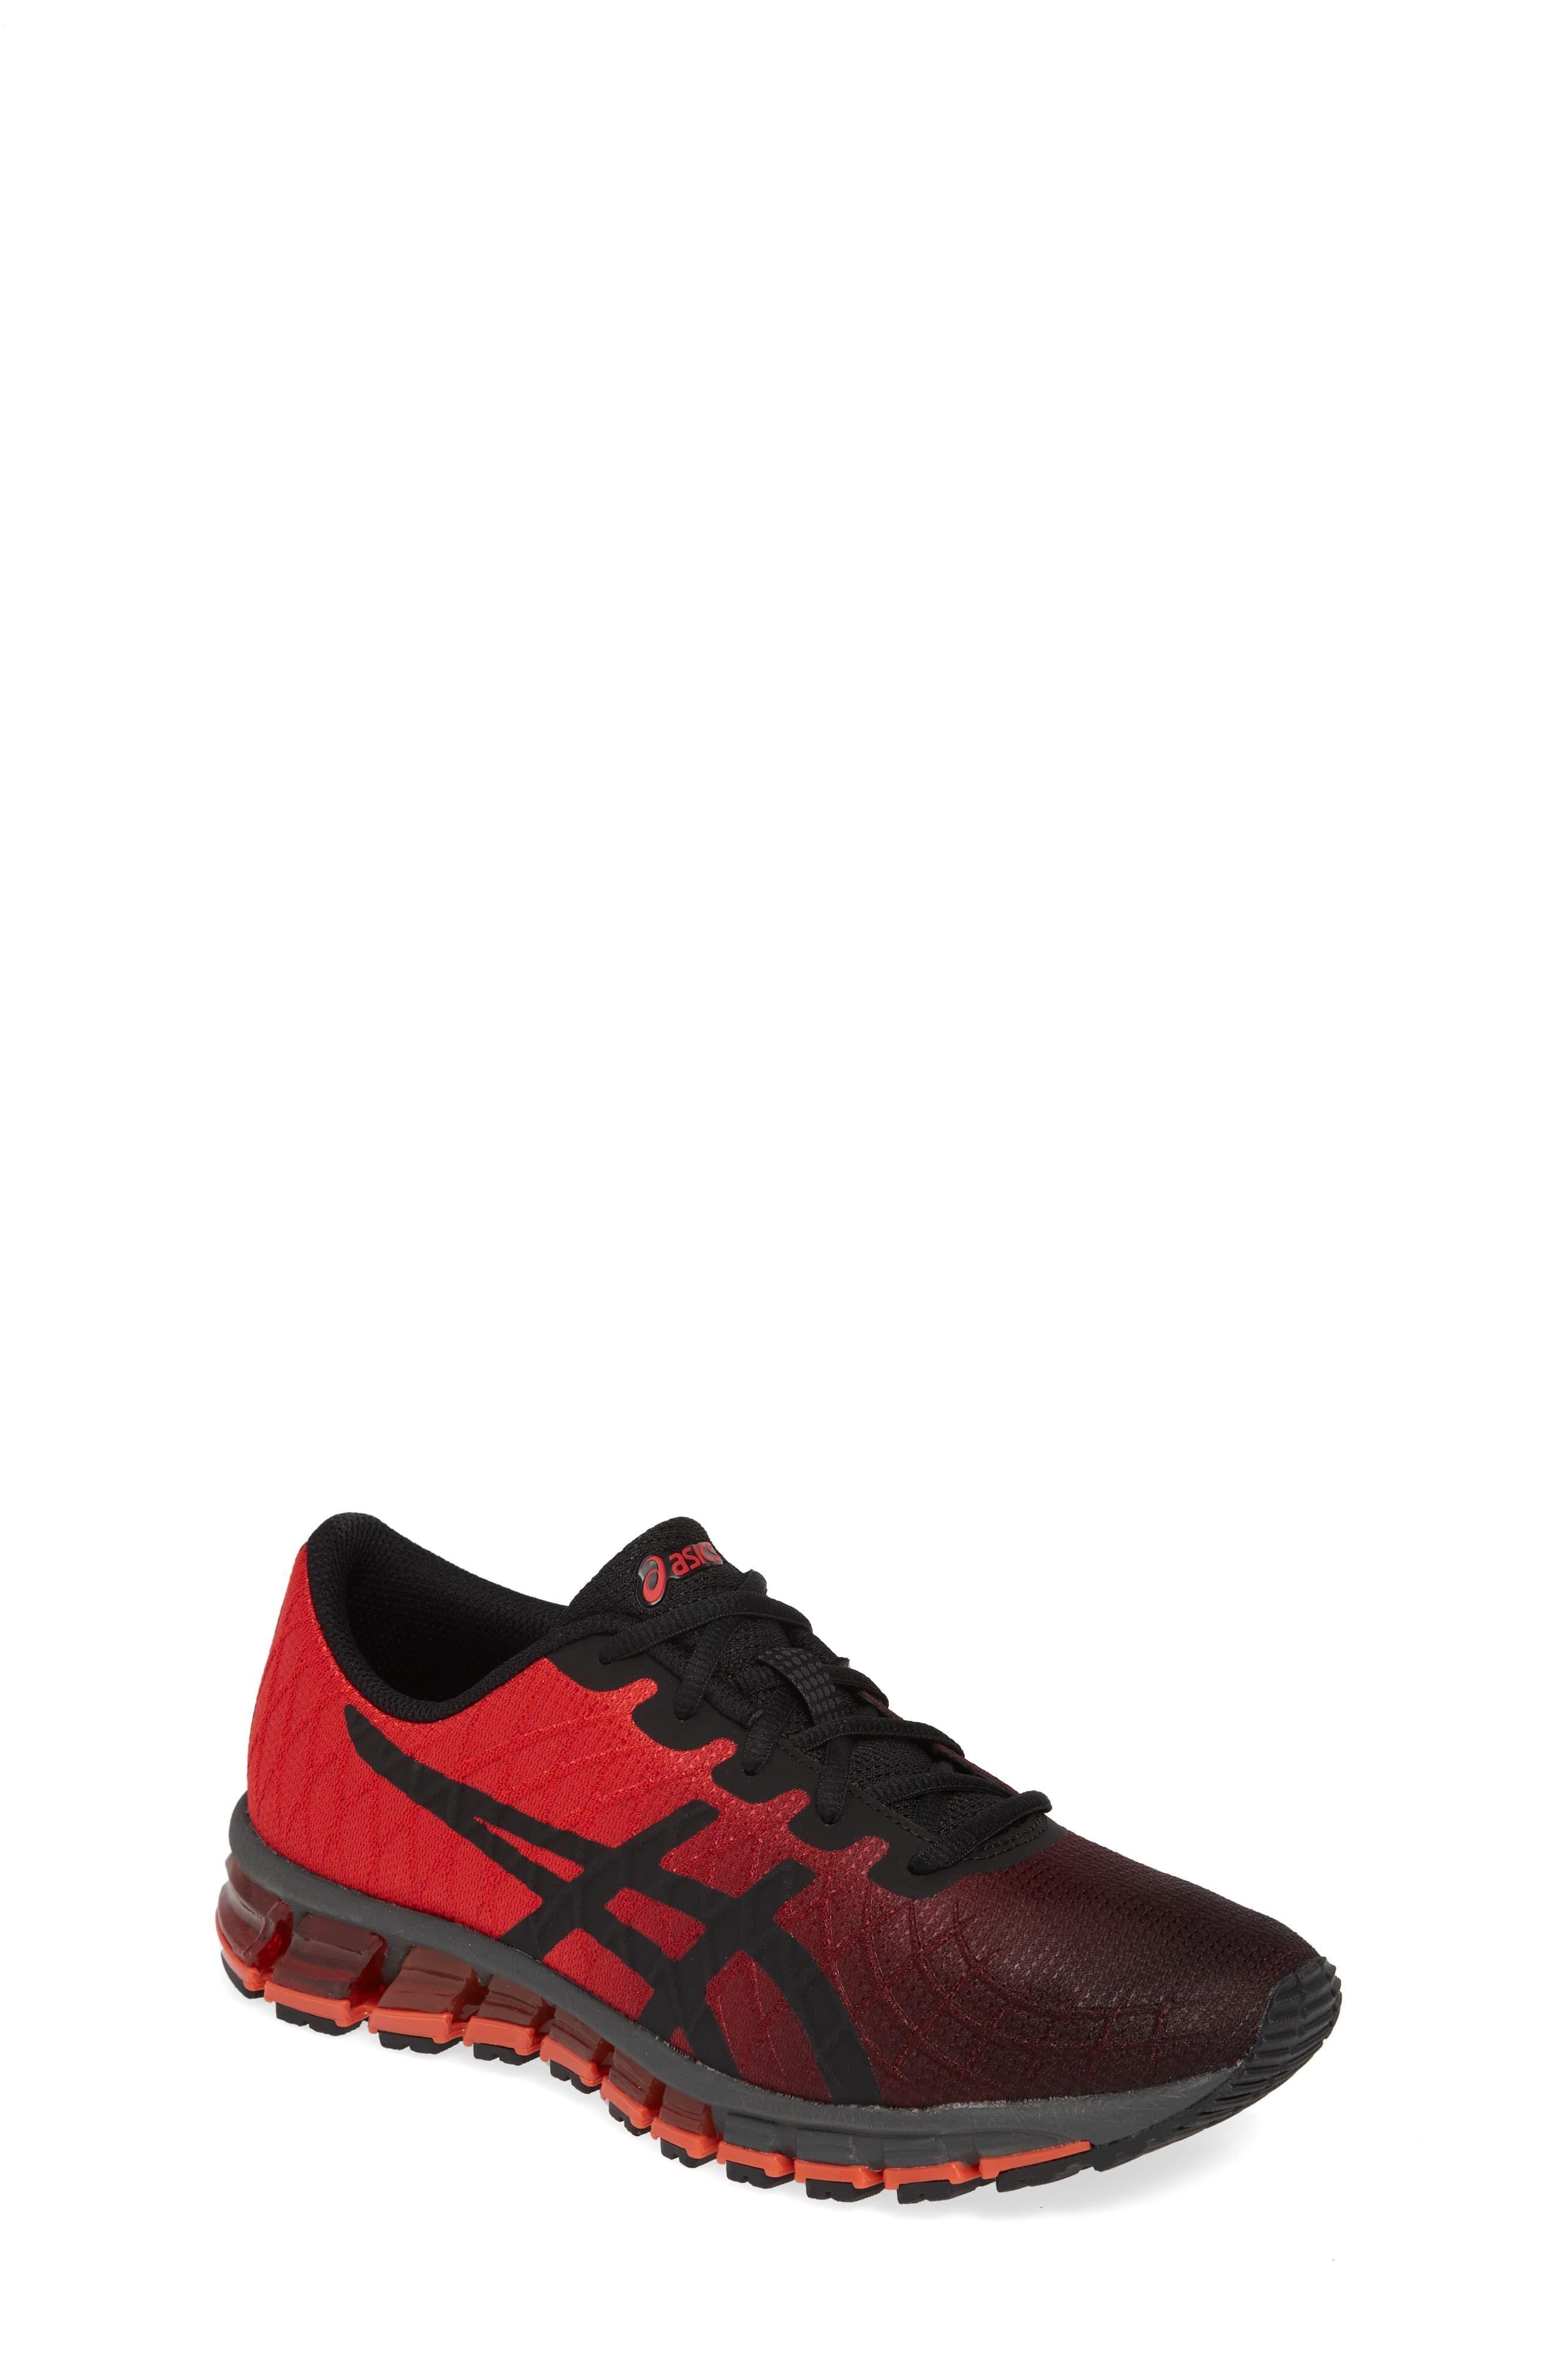 Asics Gel Quantum 180 4 Running Shoe Big Kid Running Shoes